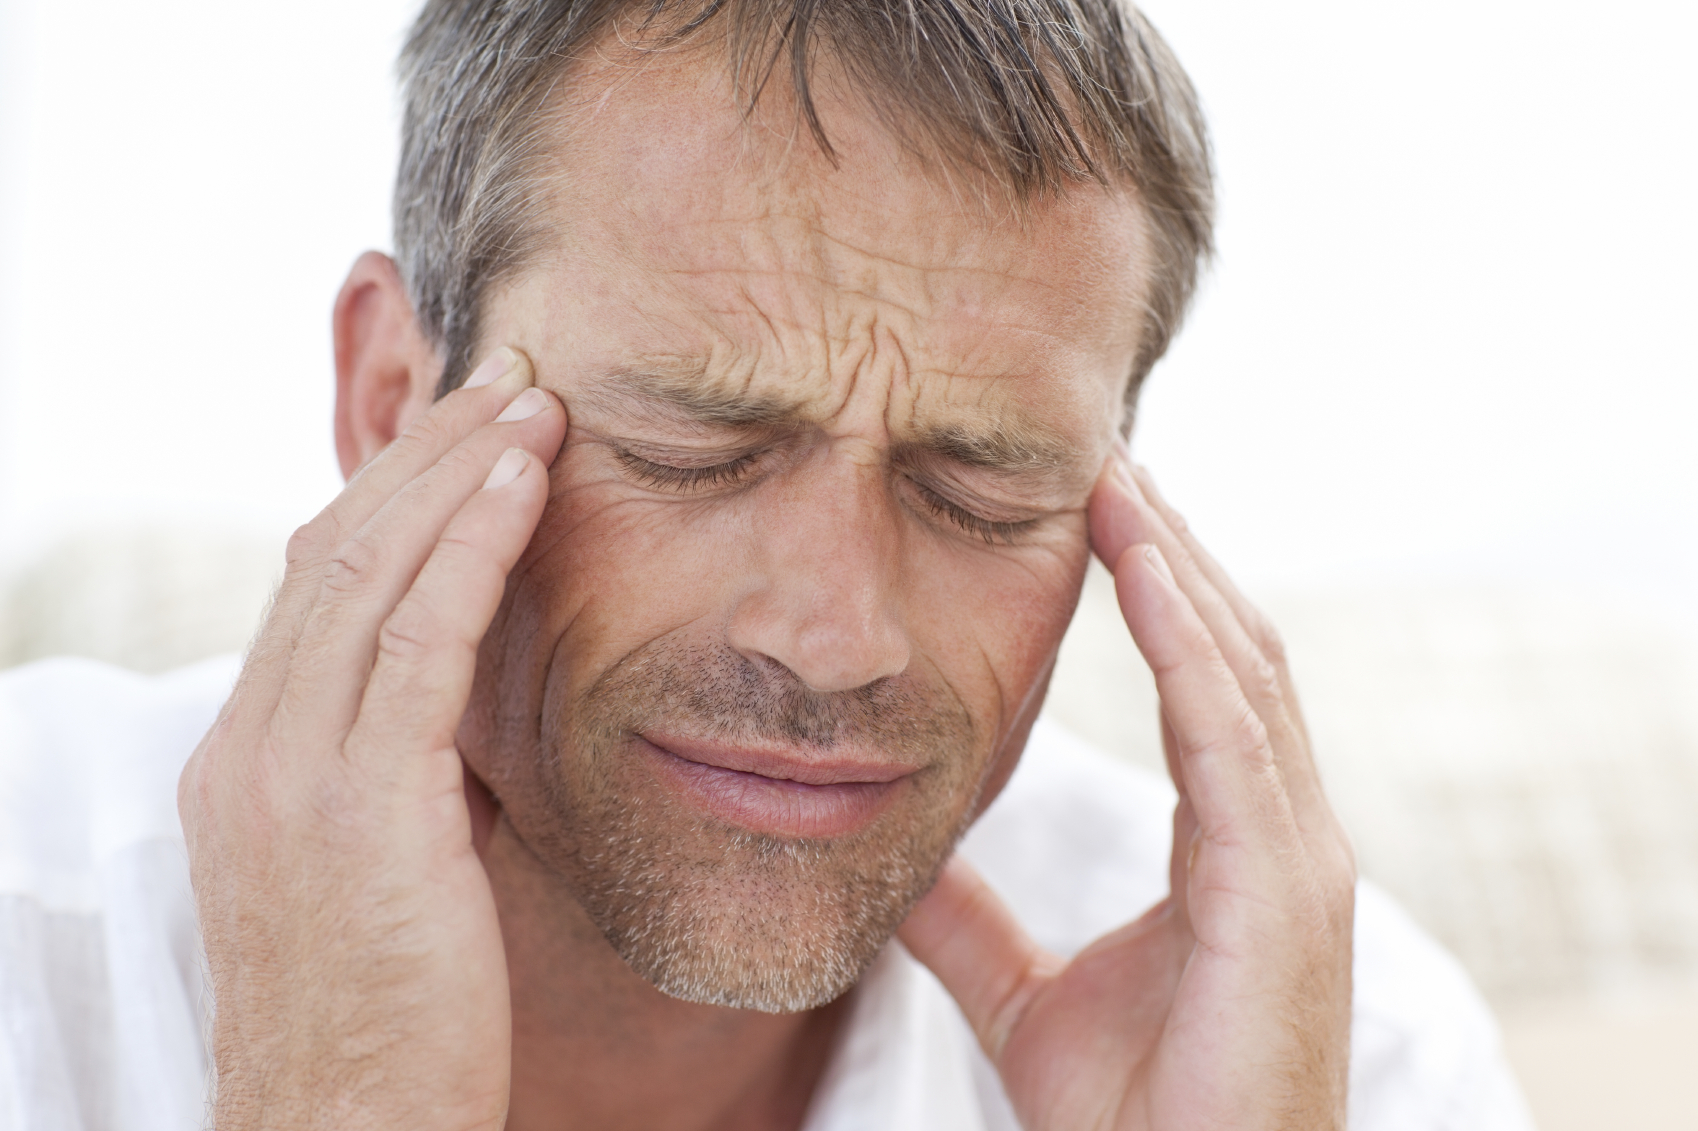 bolest-hlavy-erekce